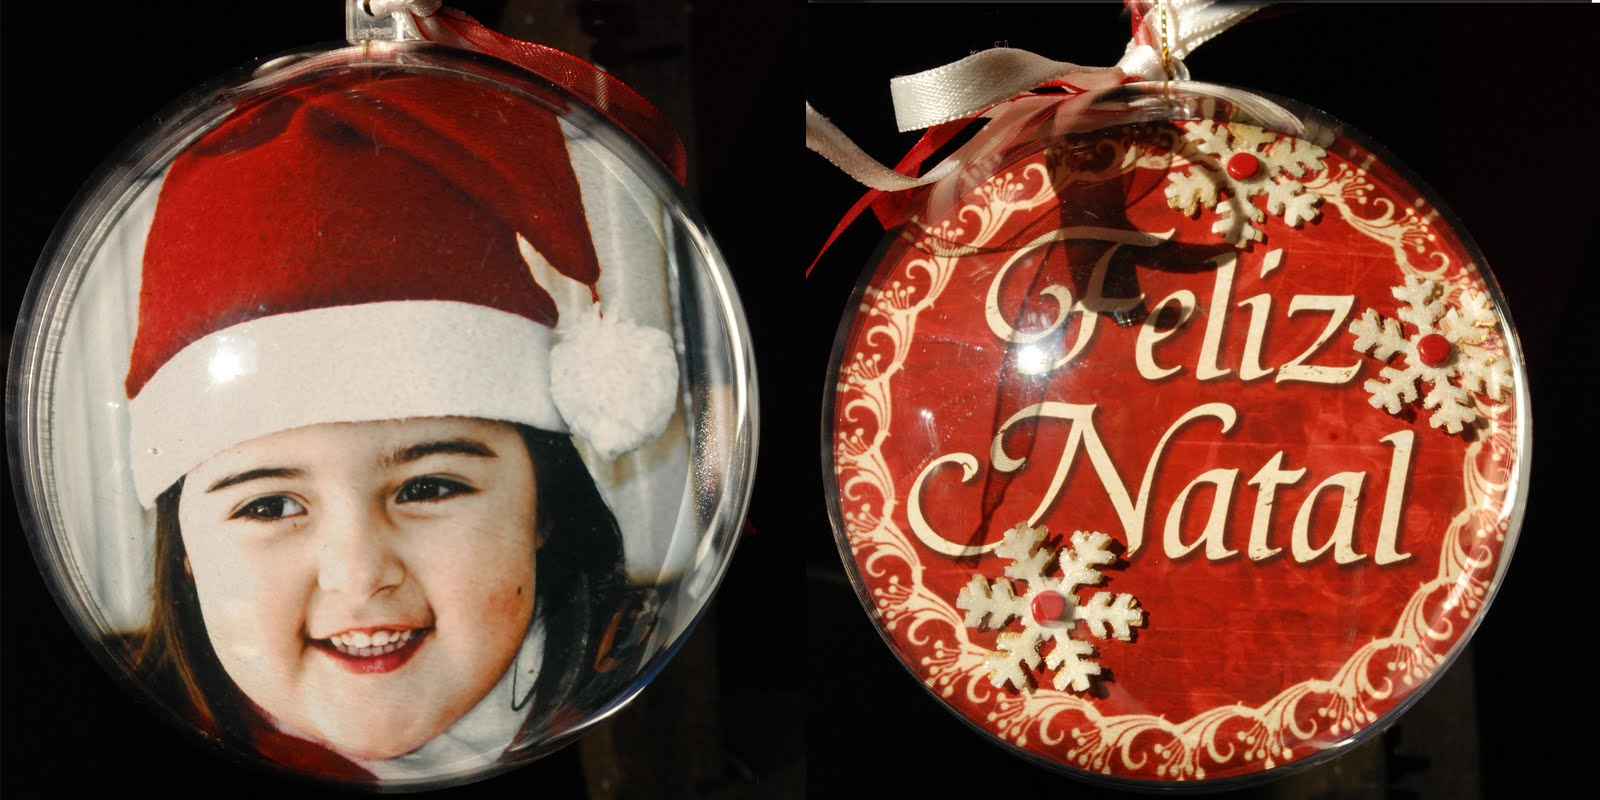 Sandra scrapbooking bolas de natal personalizadas workshop - Bolas de cristal personalizadas ...